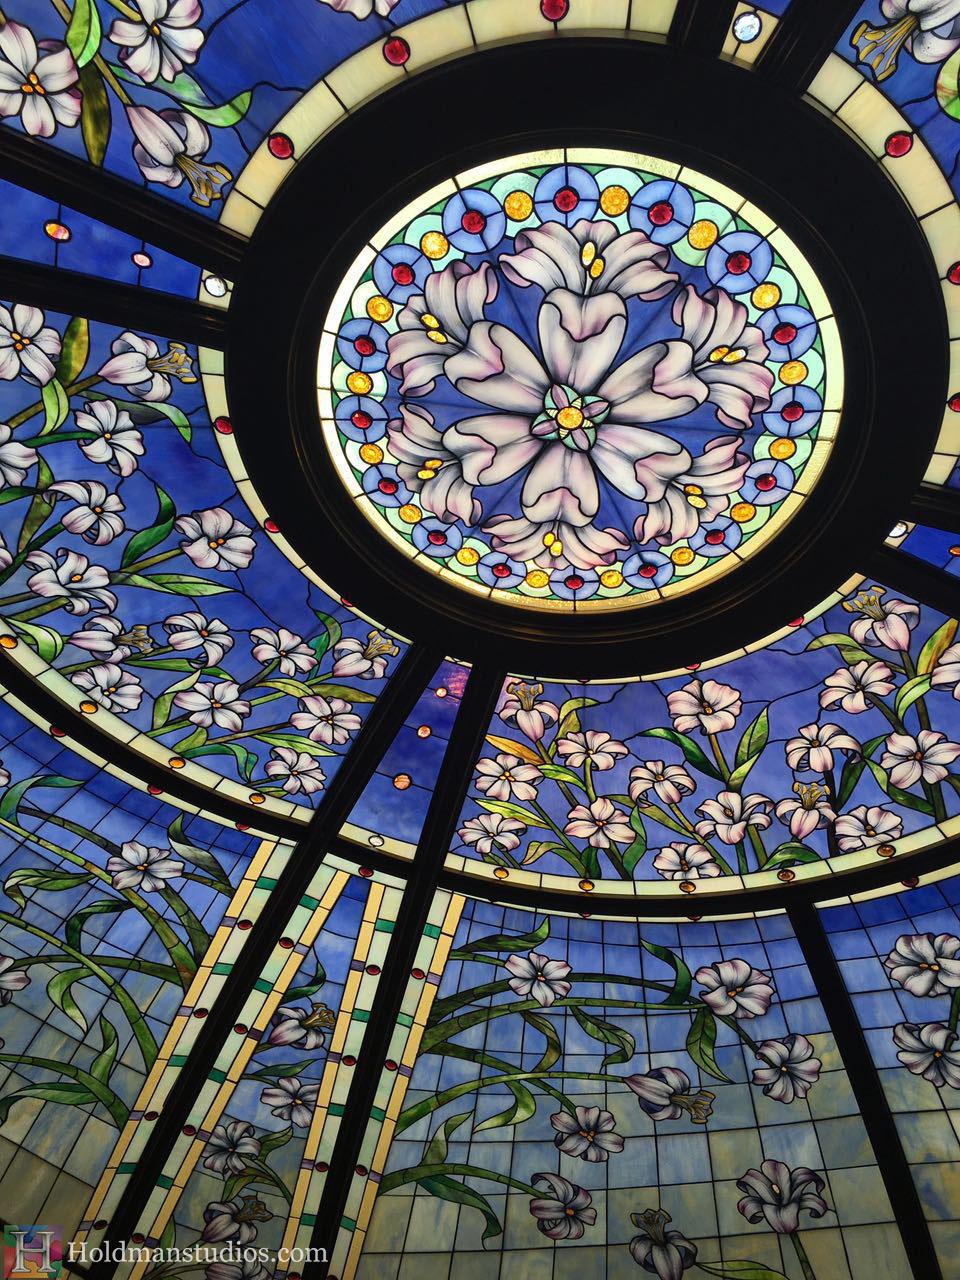 Holdman-Studios-Stained-Glass-Paris-LDS-Temple-Martagon-Lily-Flowers-Sun-Moon-Stars-Grand-Skylight-Window-Crop.jpg